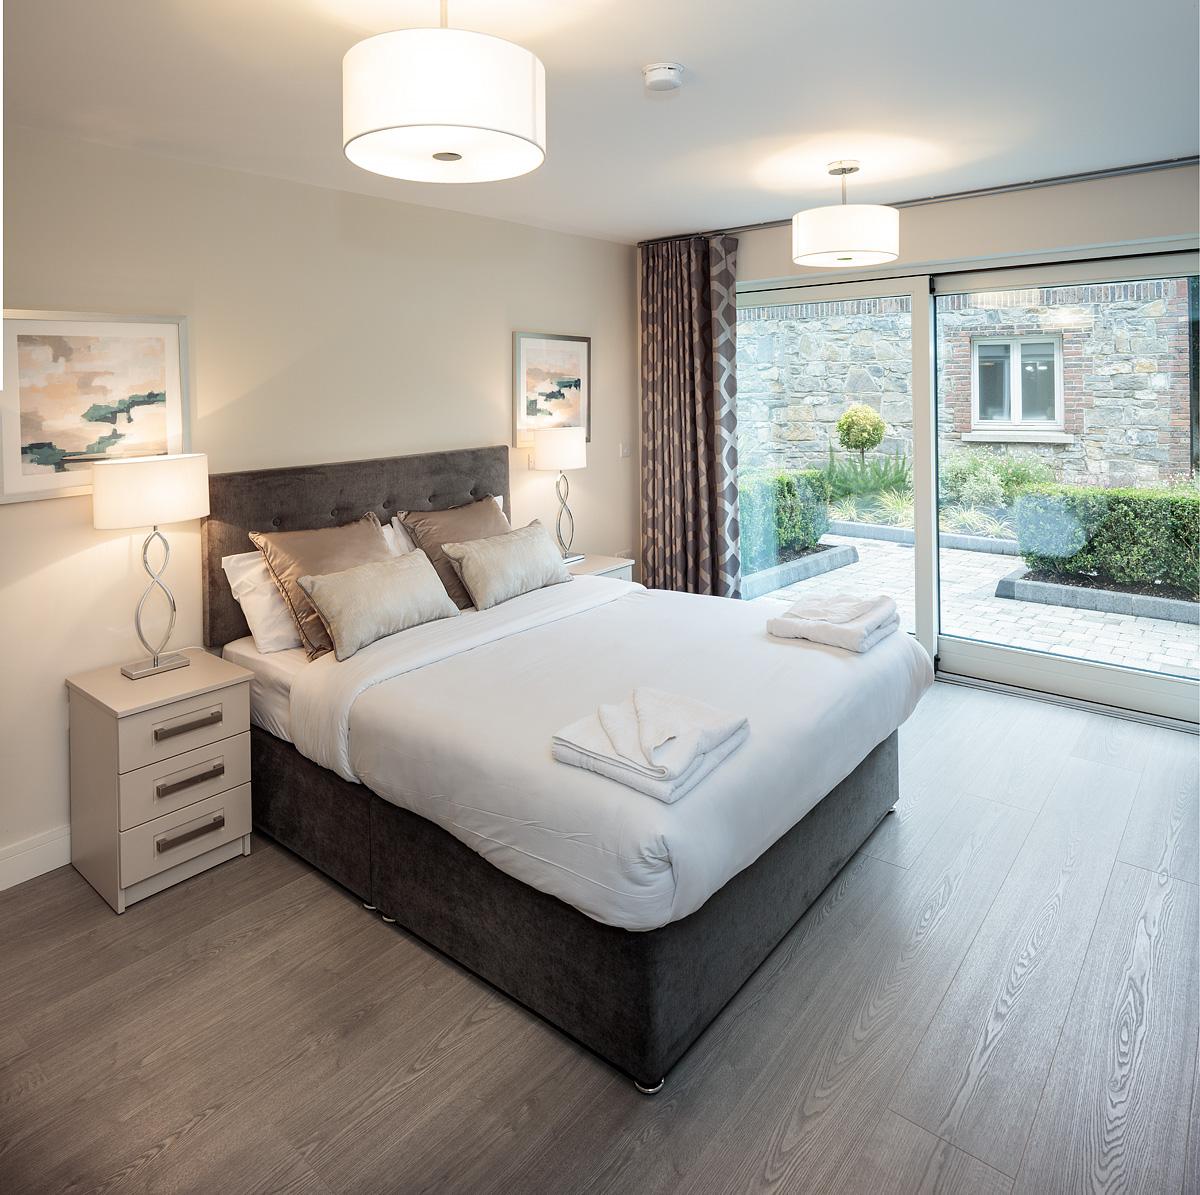 Bedroom at Baggot Rath House Apartments, Ballsbridge, Dublin